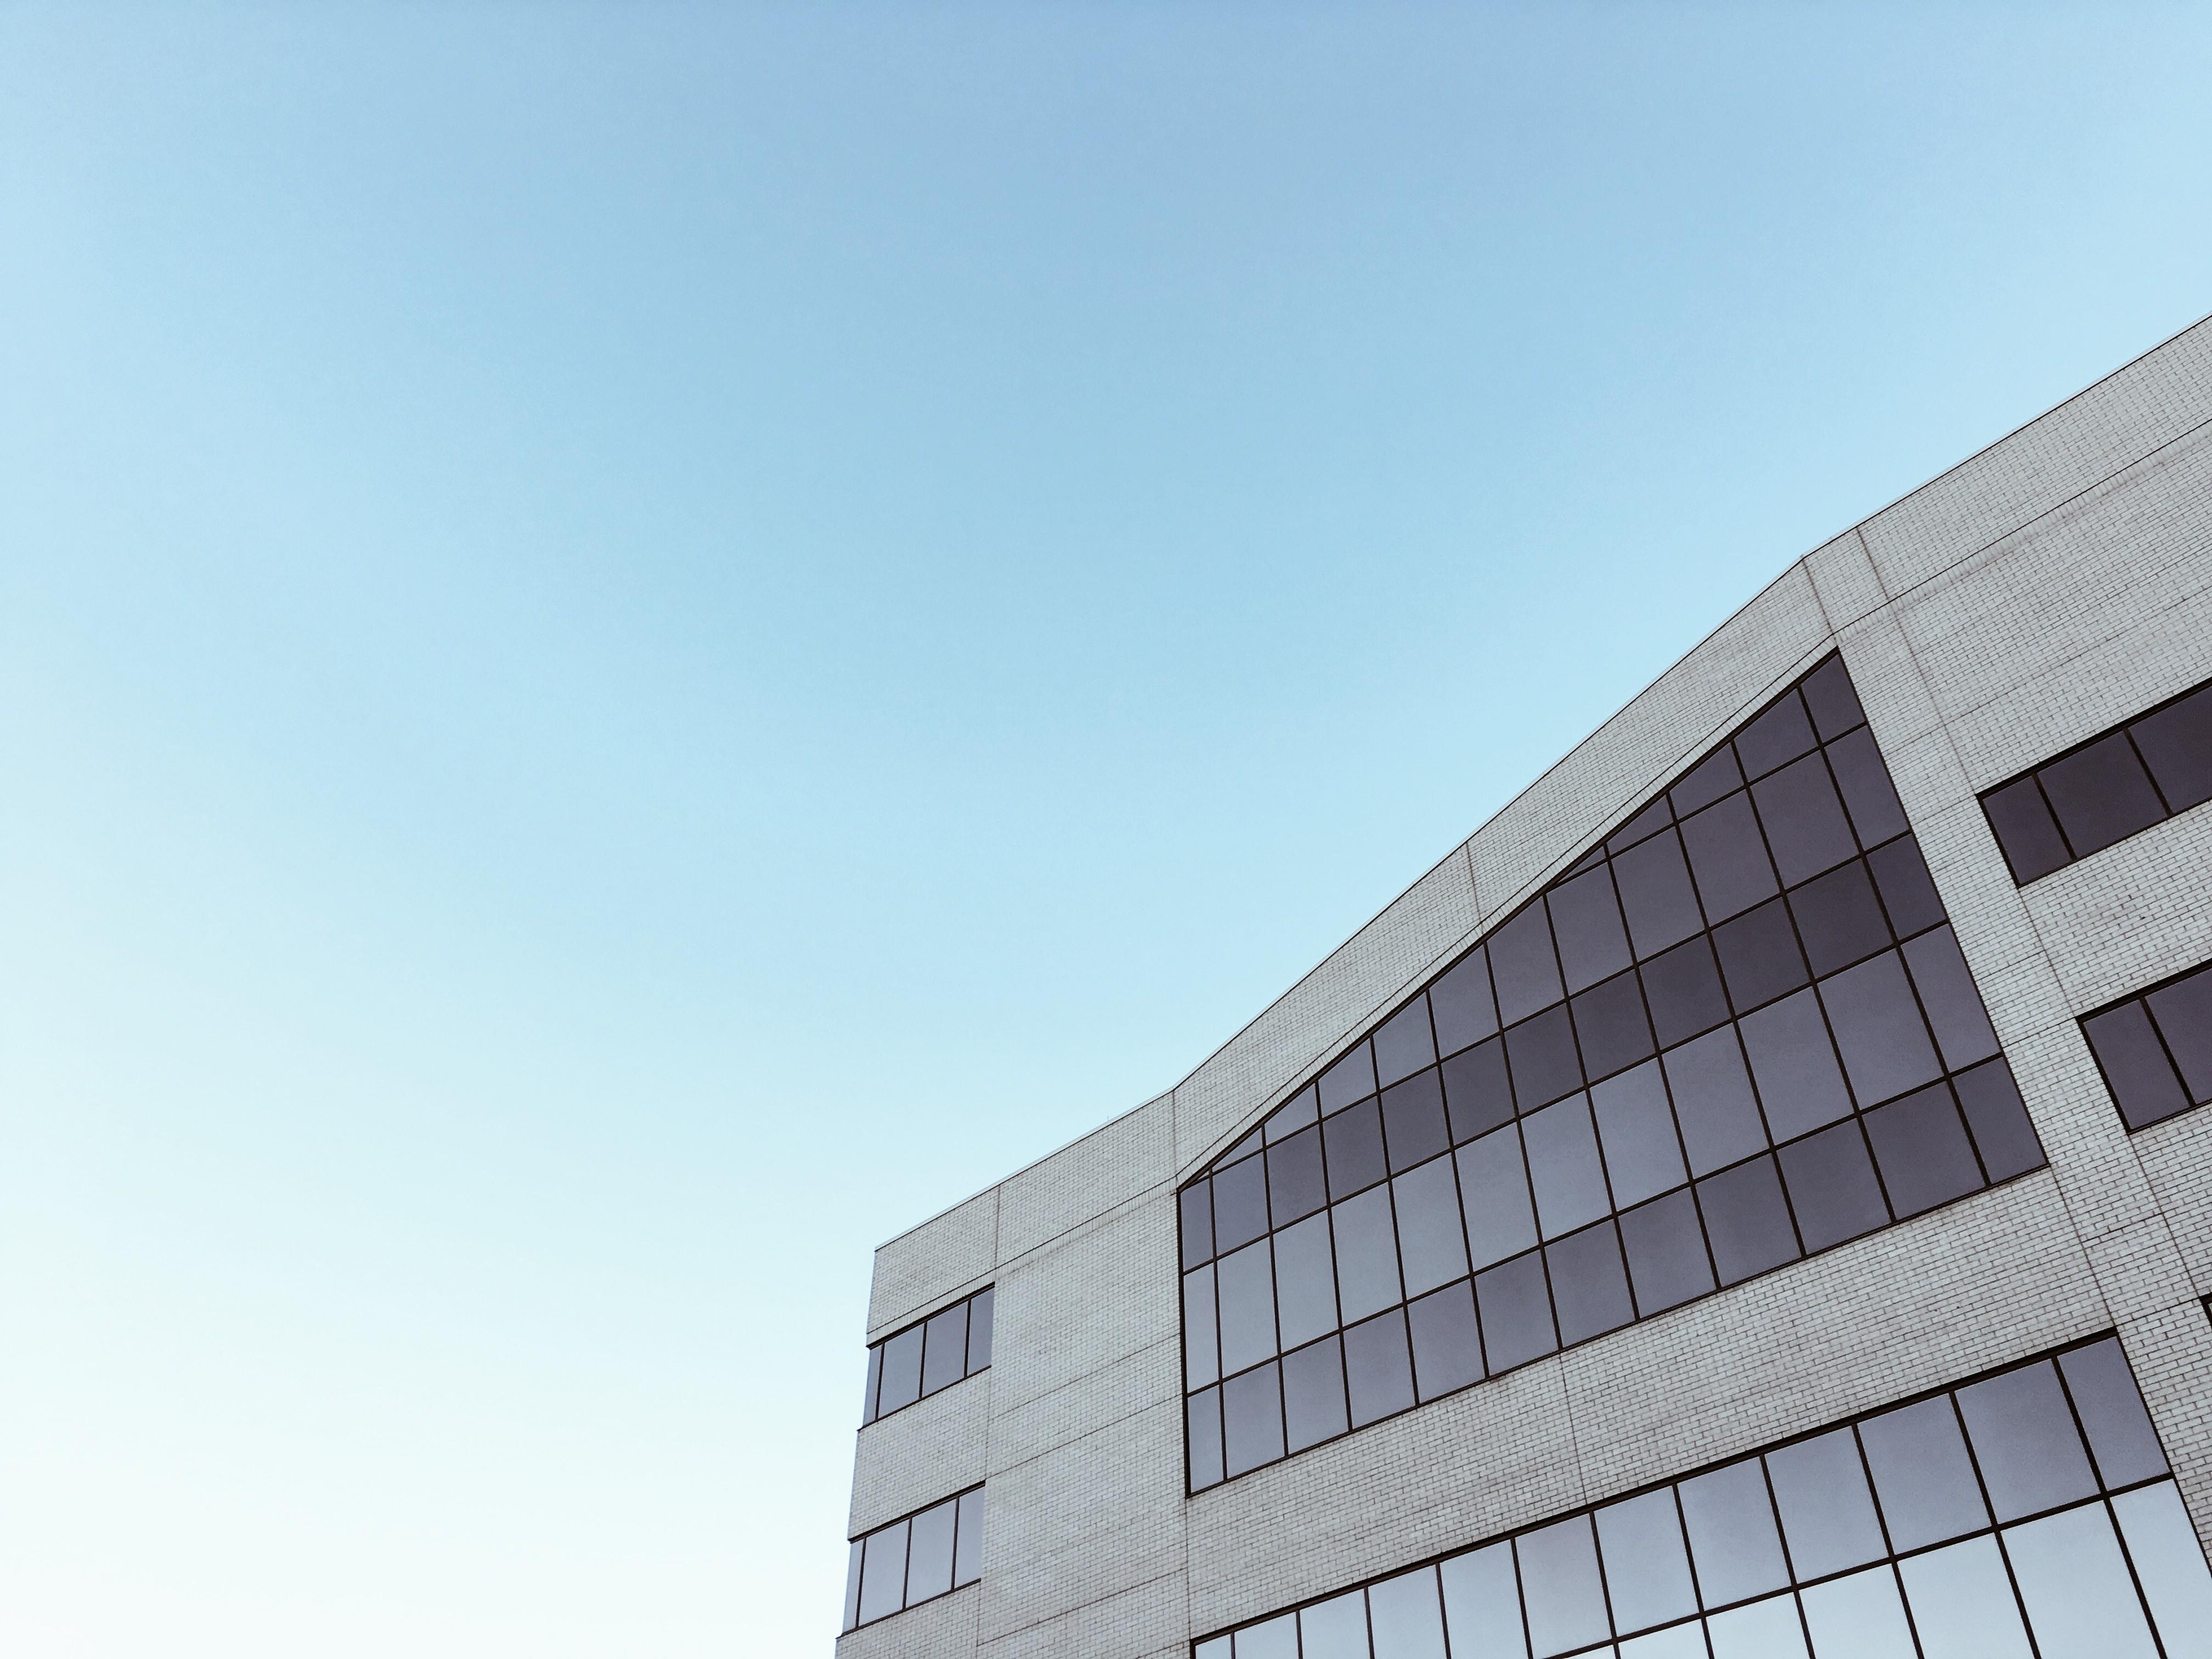 General 4032x3024 architecture building sky minimalism